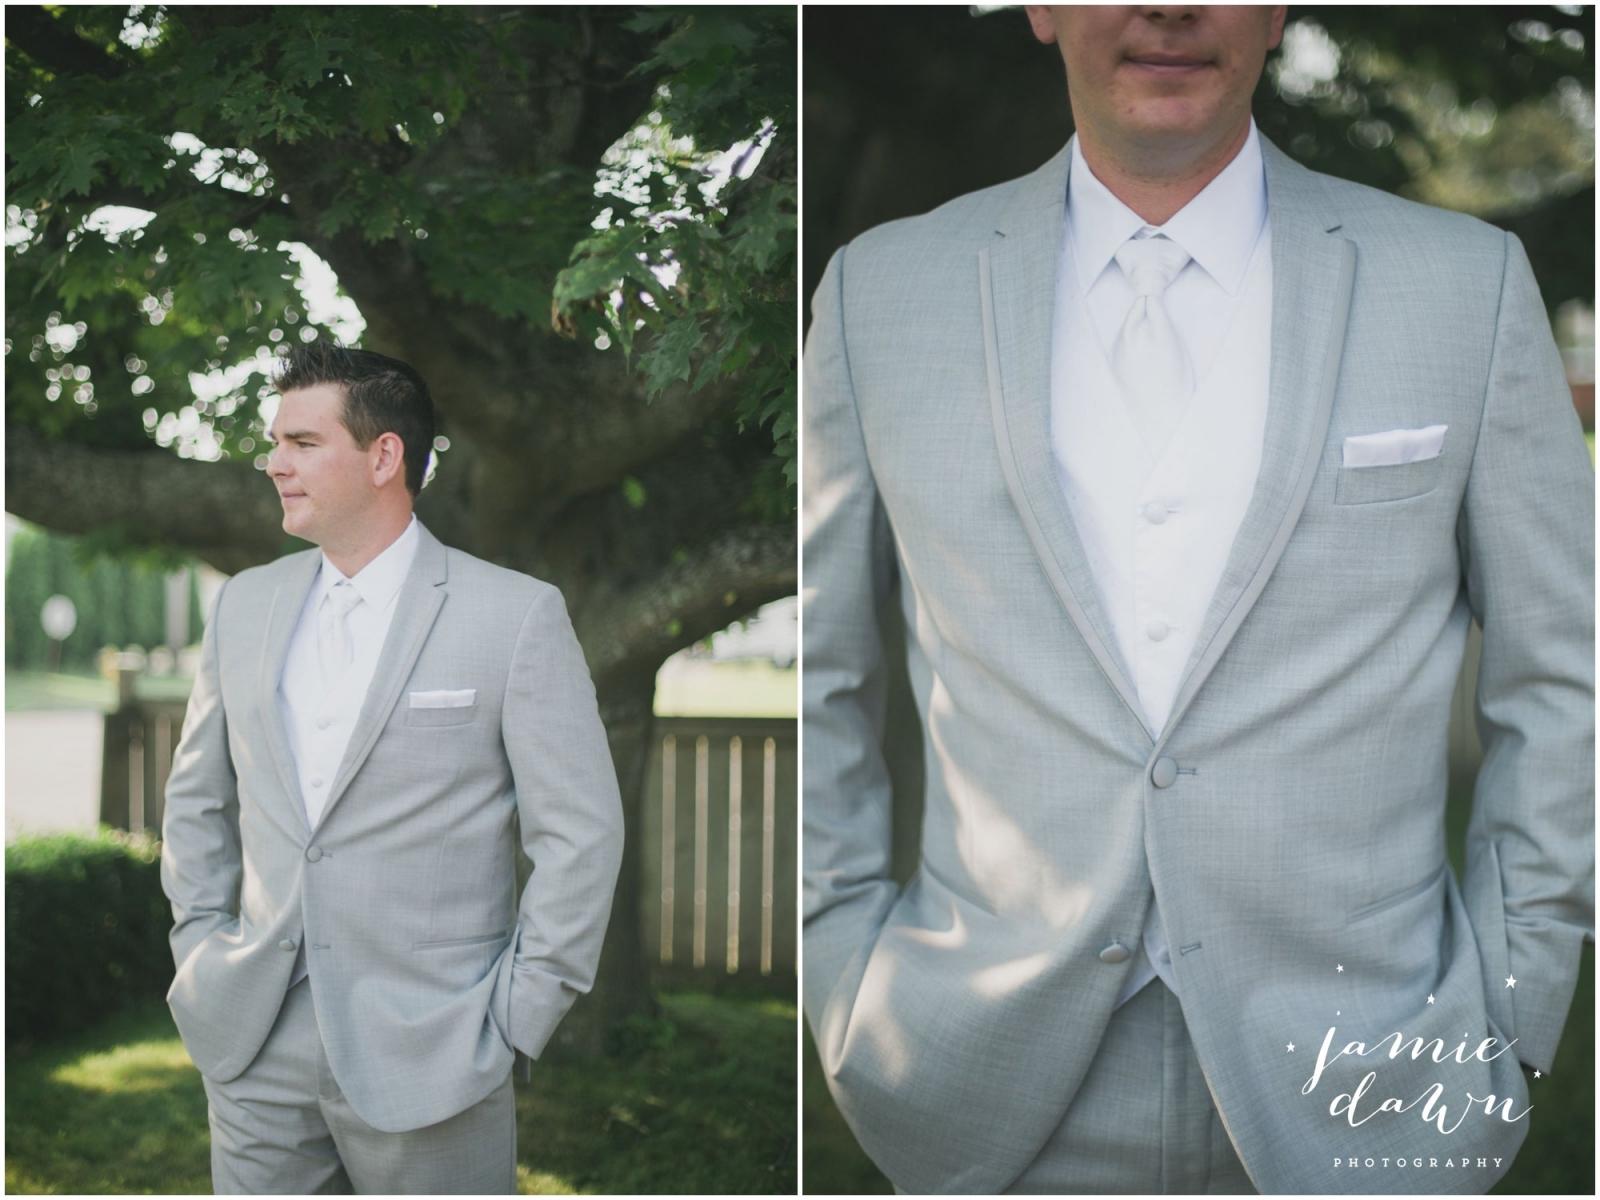 Missy+Tom=Summer Travel Wedding - Jamie Dawn Photography